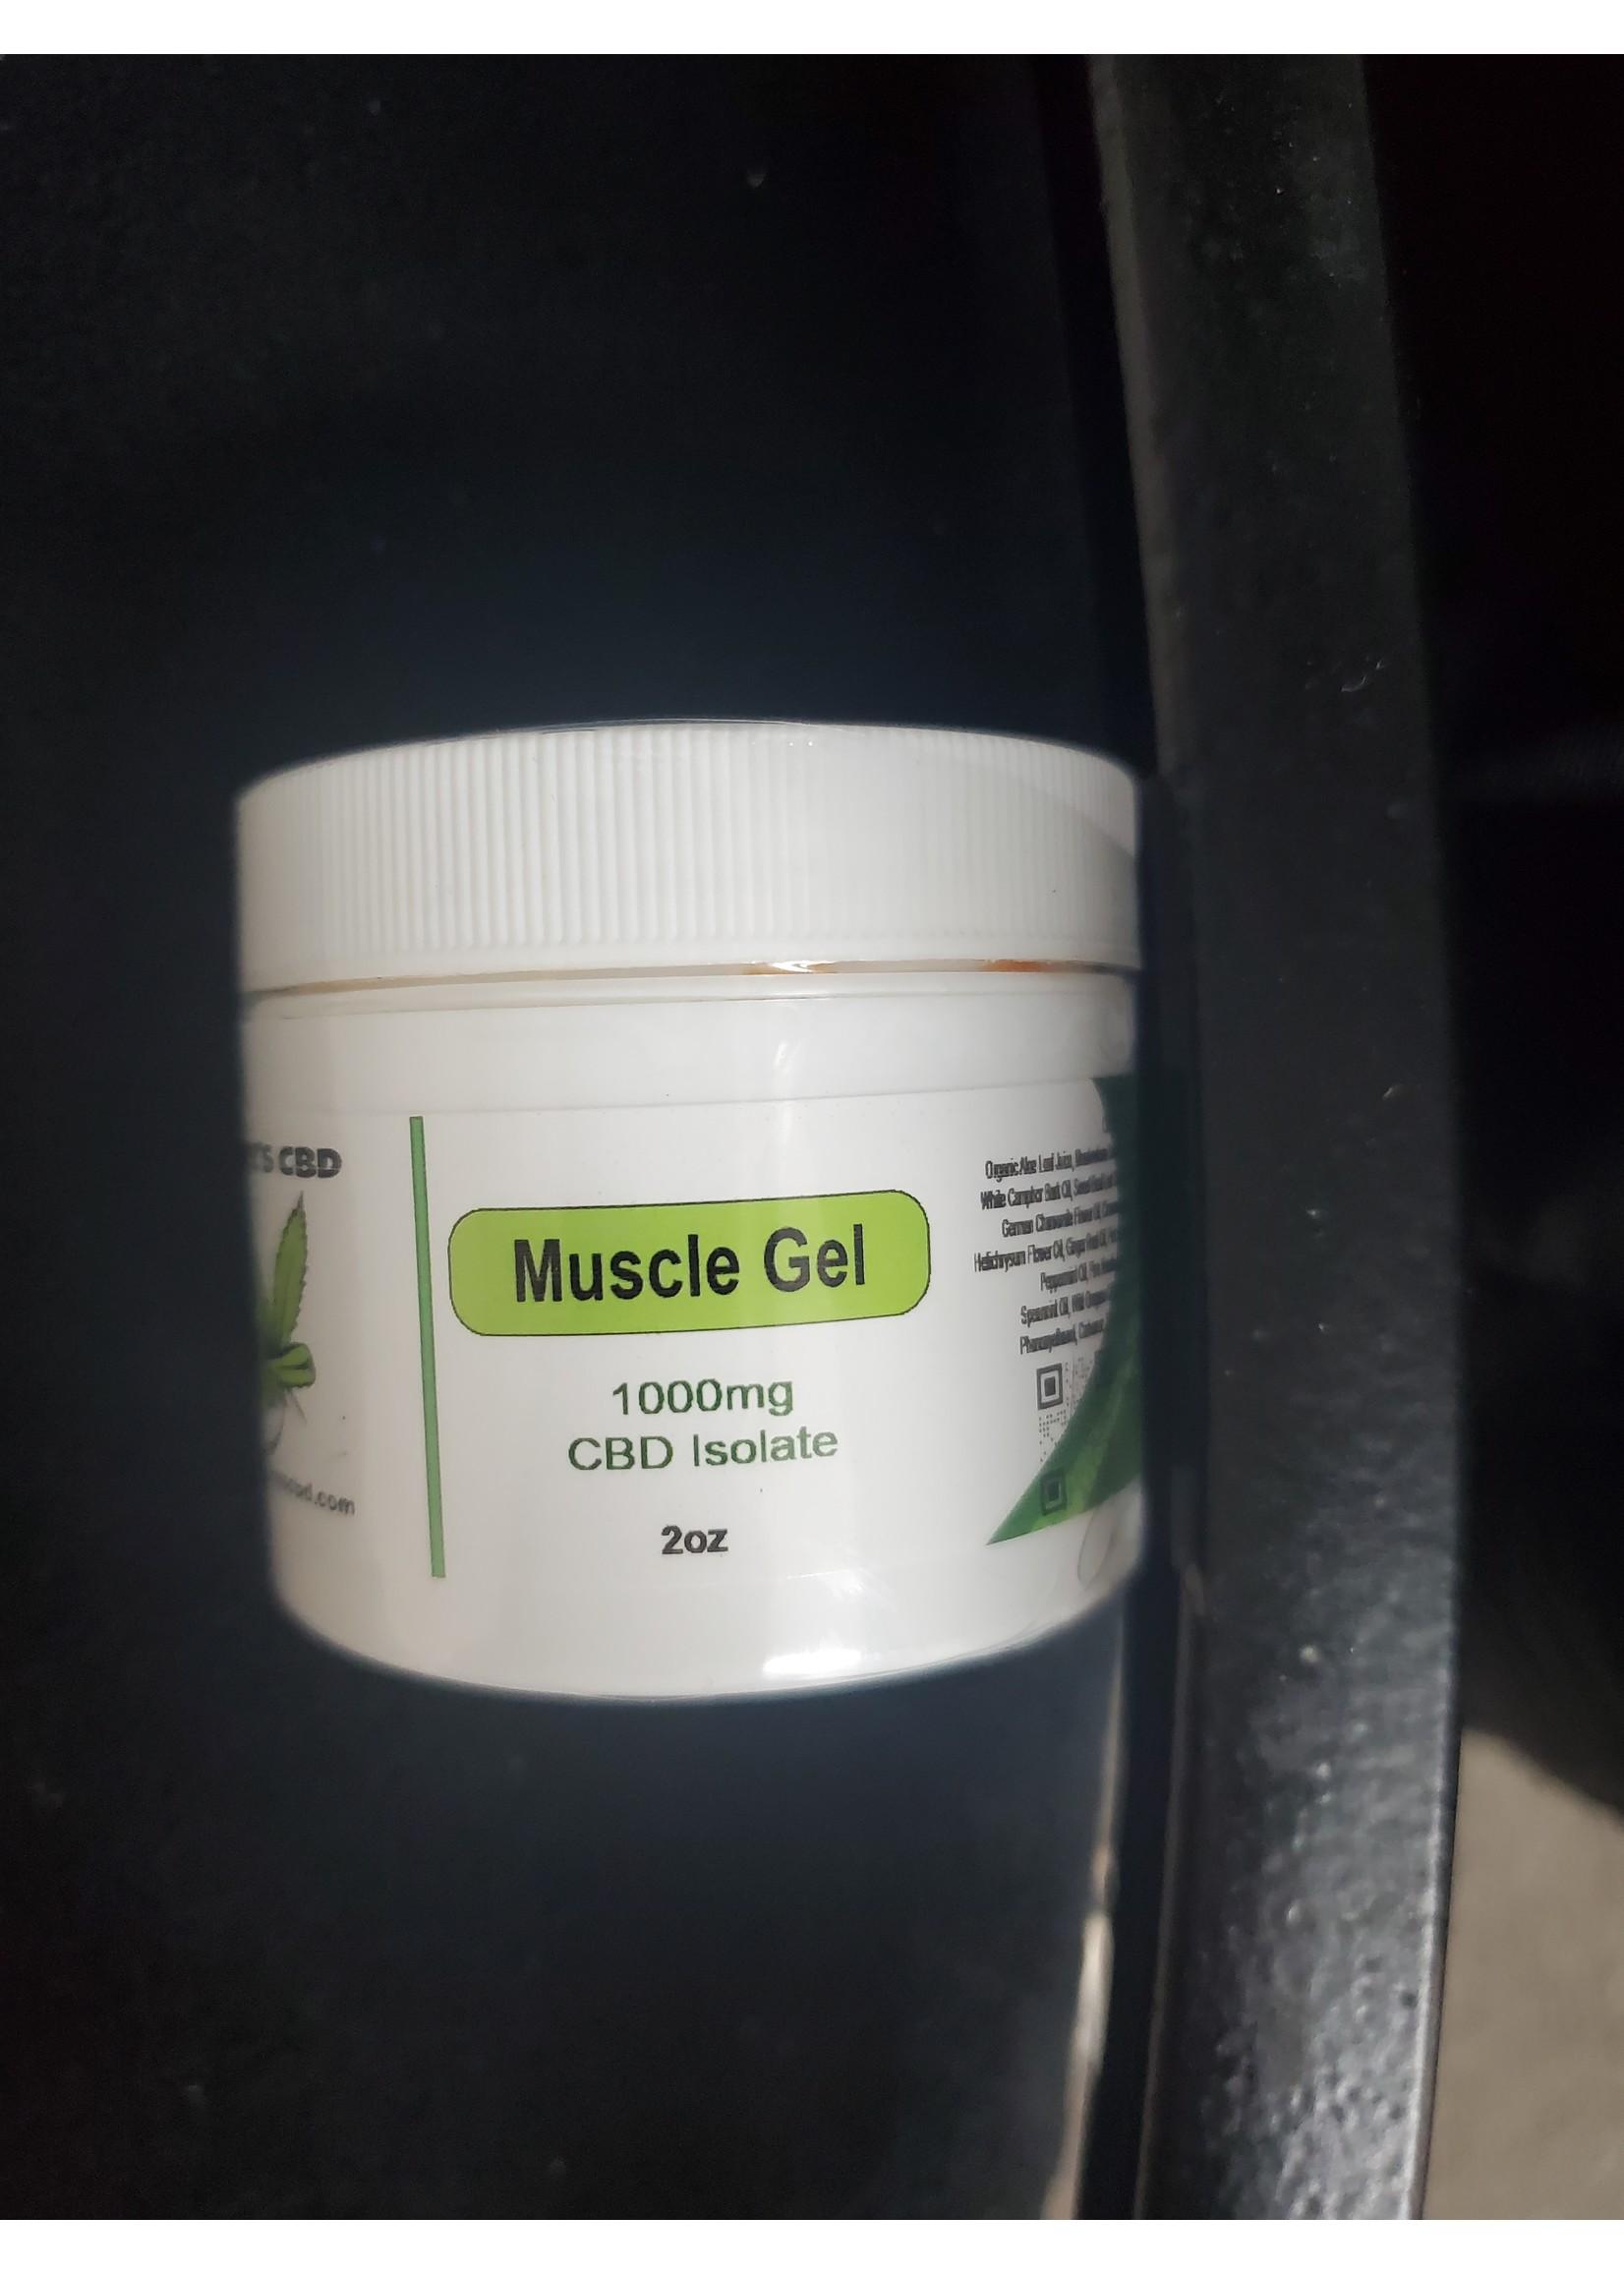 Rowe's CBD 1000mg CBD Isolate Muscle Gel